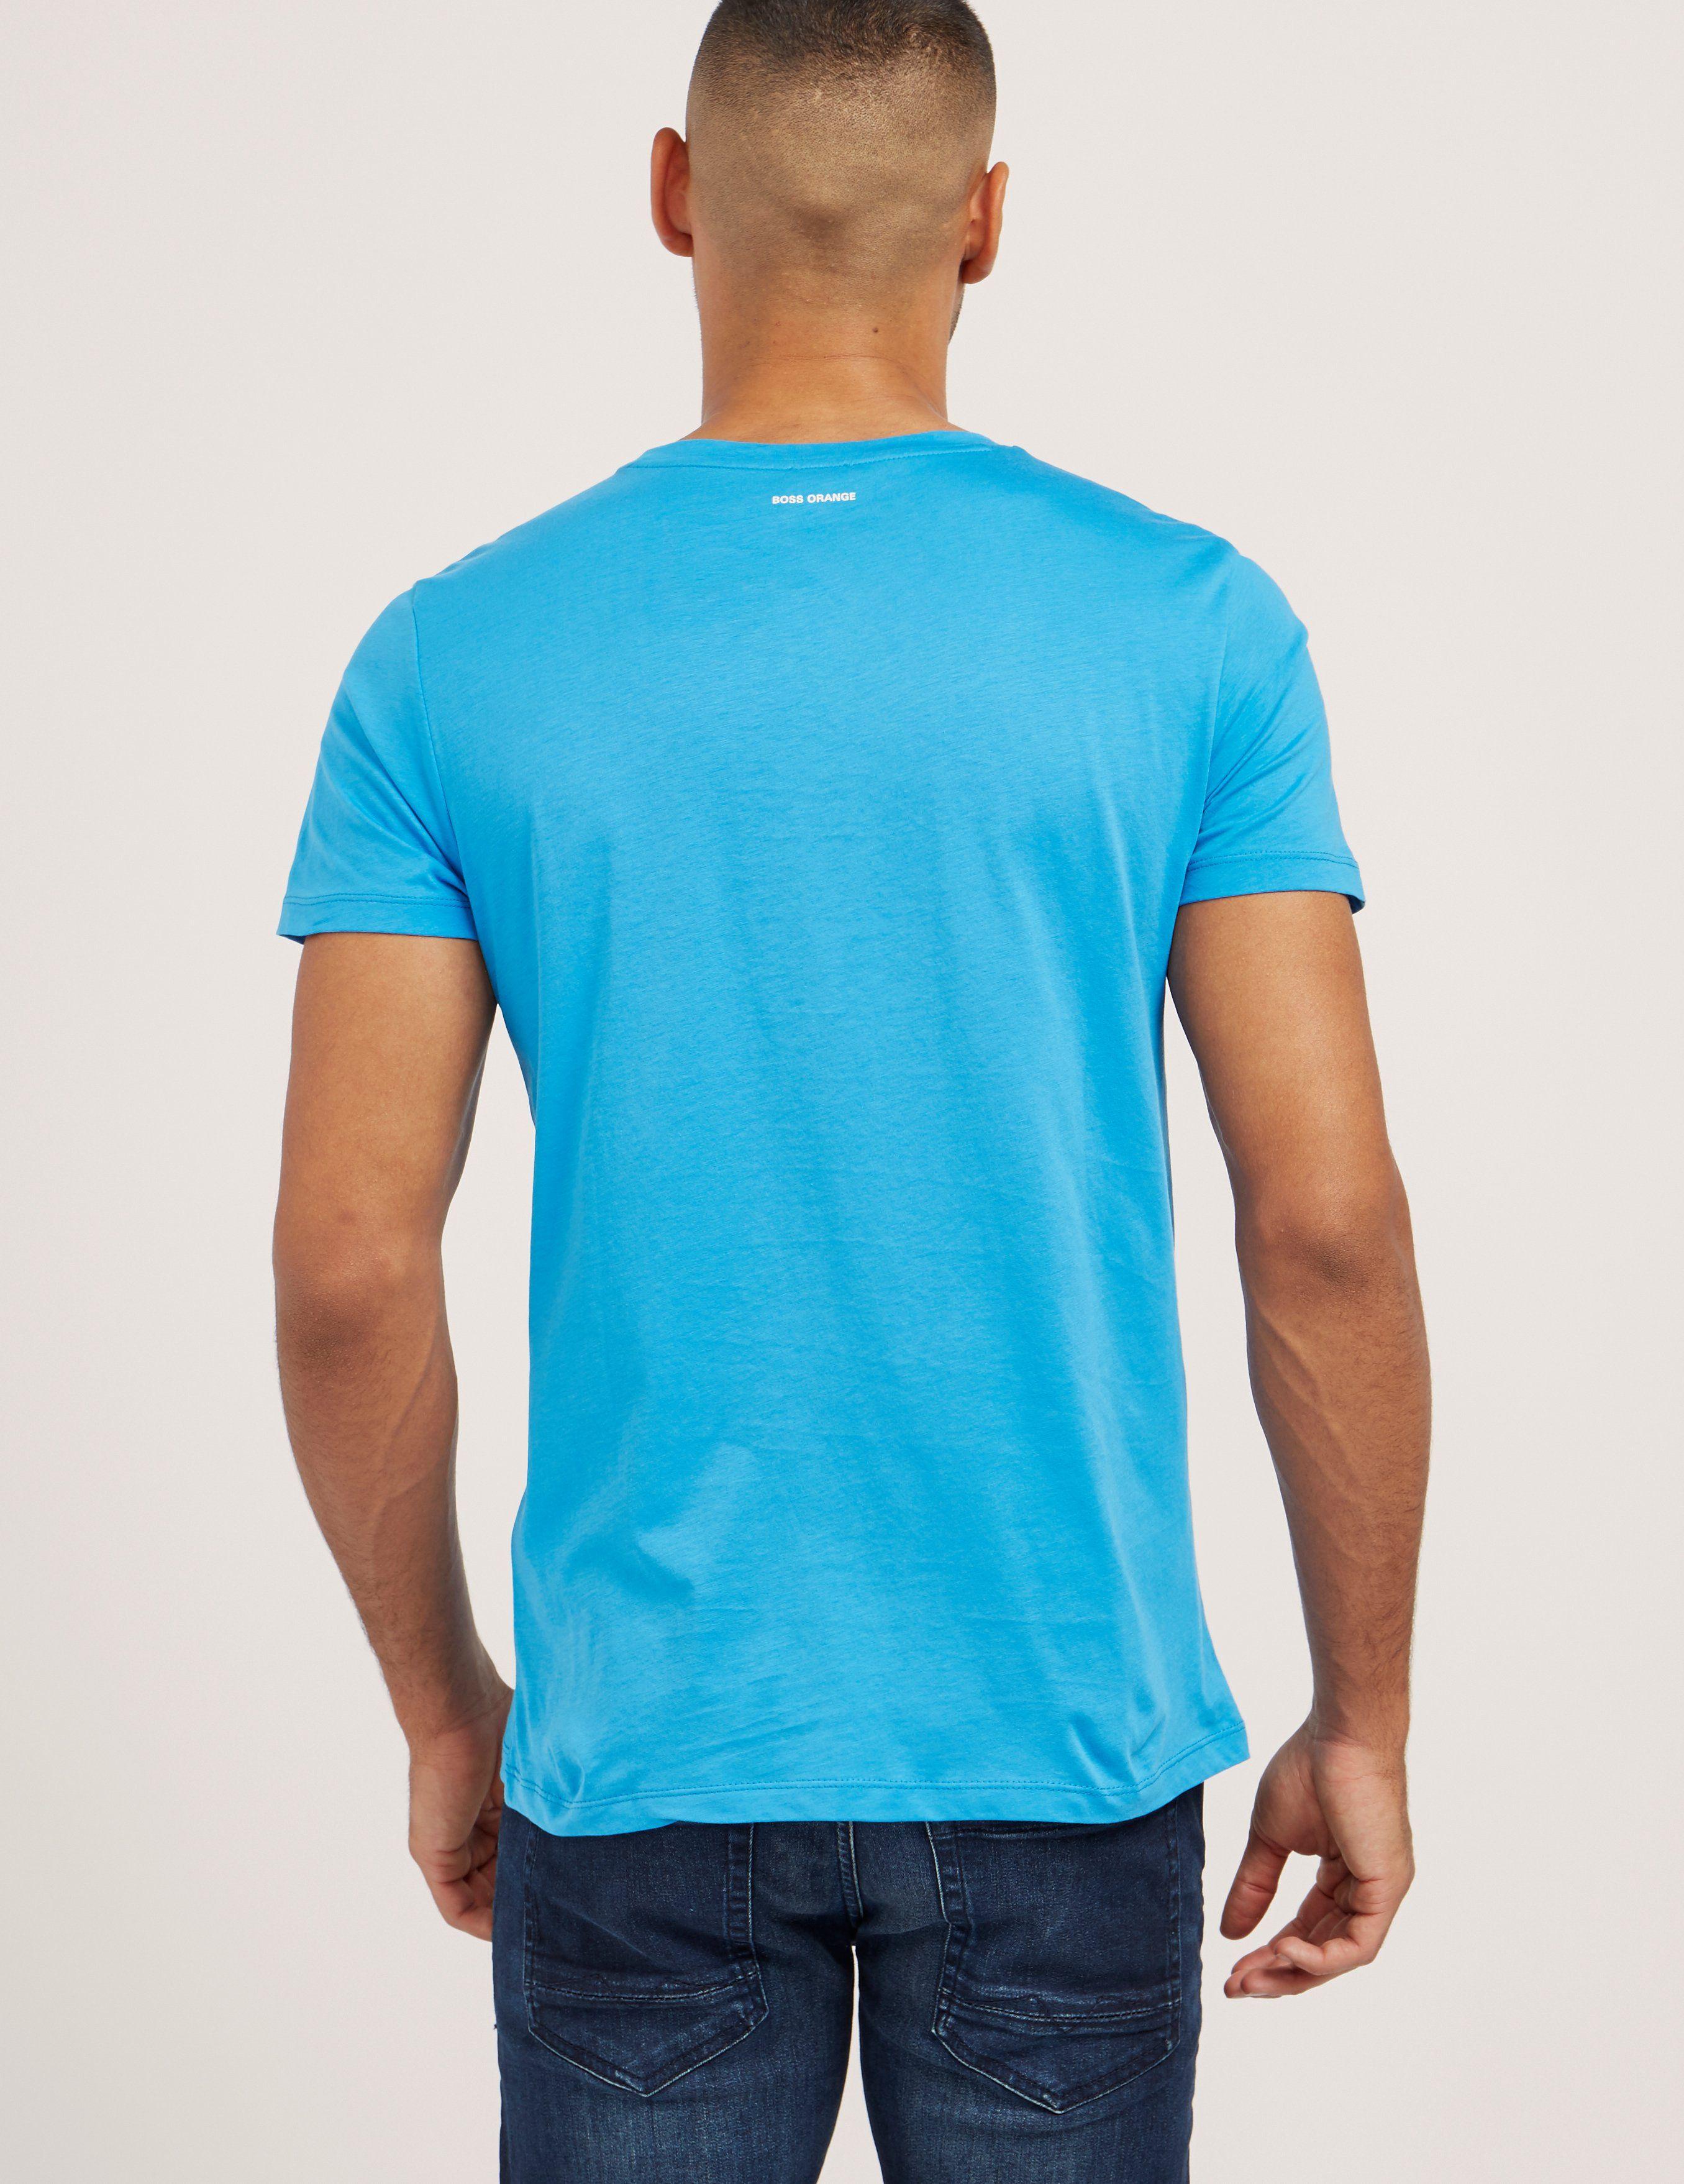 BOSS Orange Turbulence Short Sleeve T-Shirt